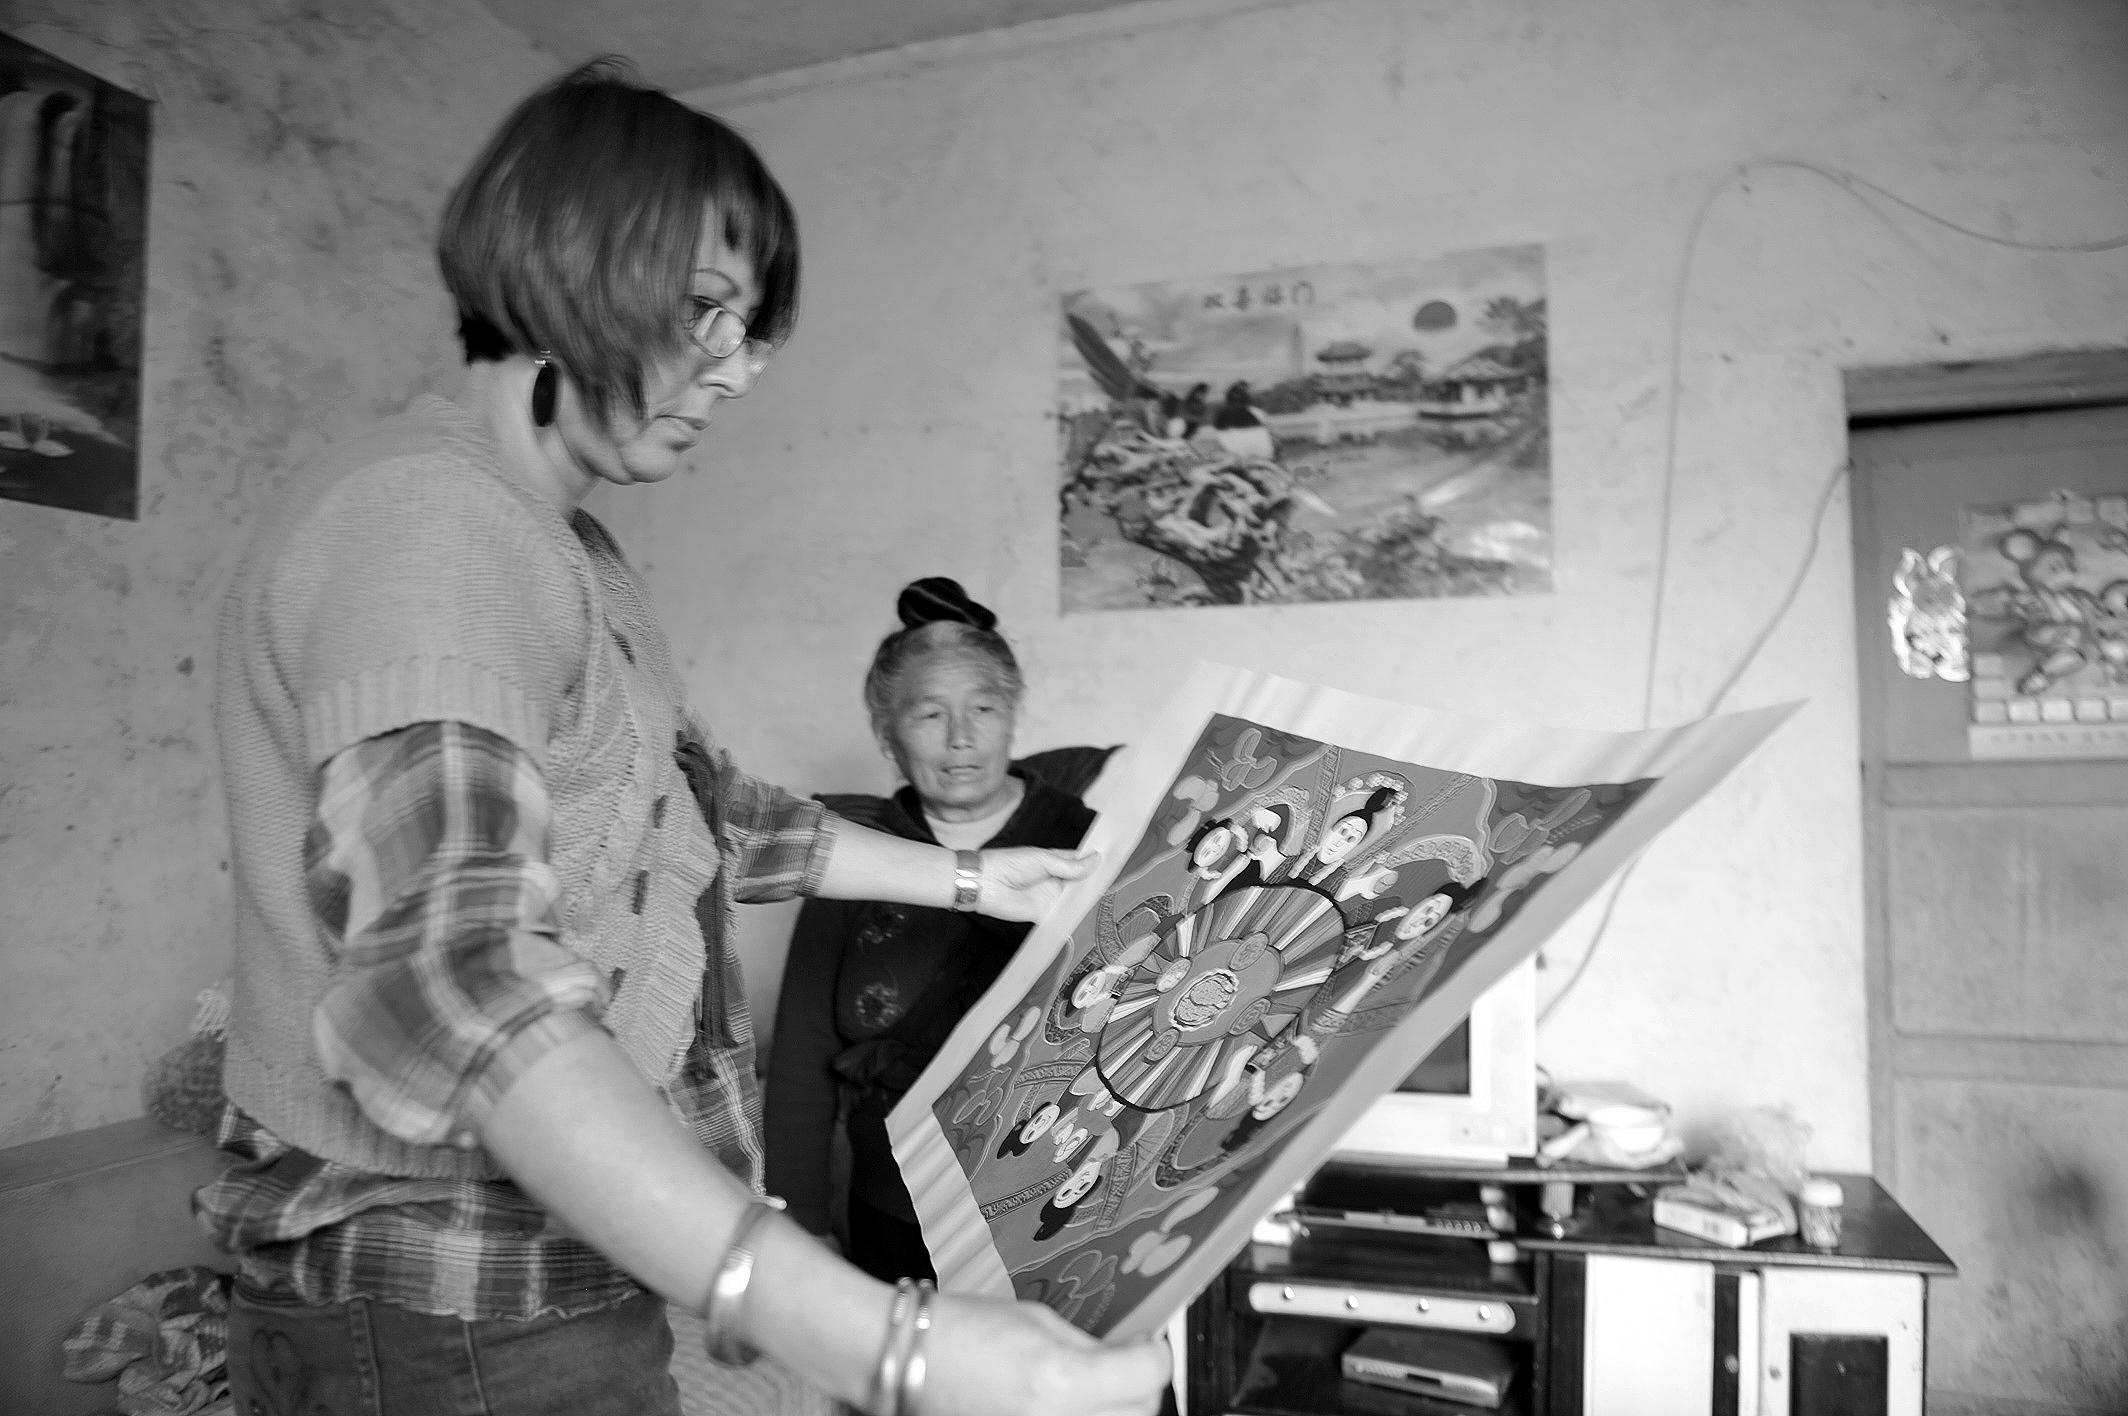 Bena-artiste-peintre-voyage-en-chine